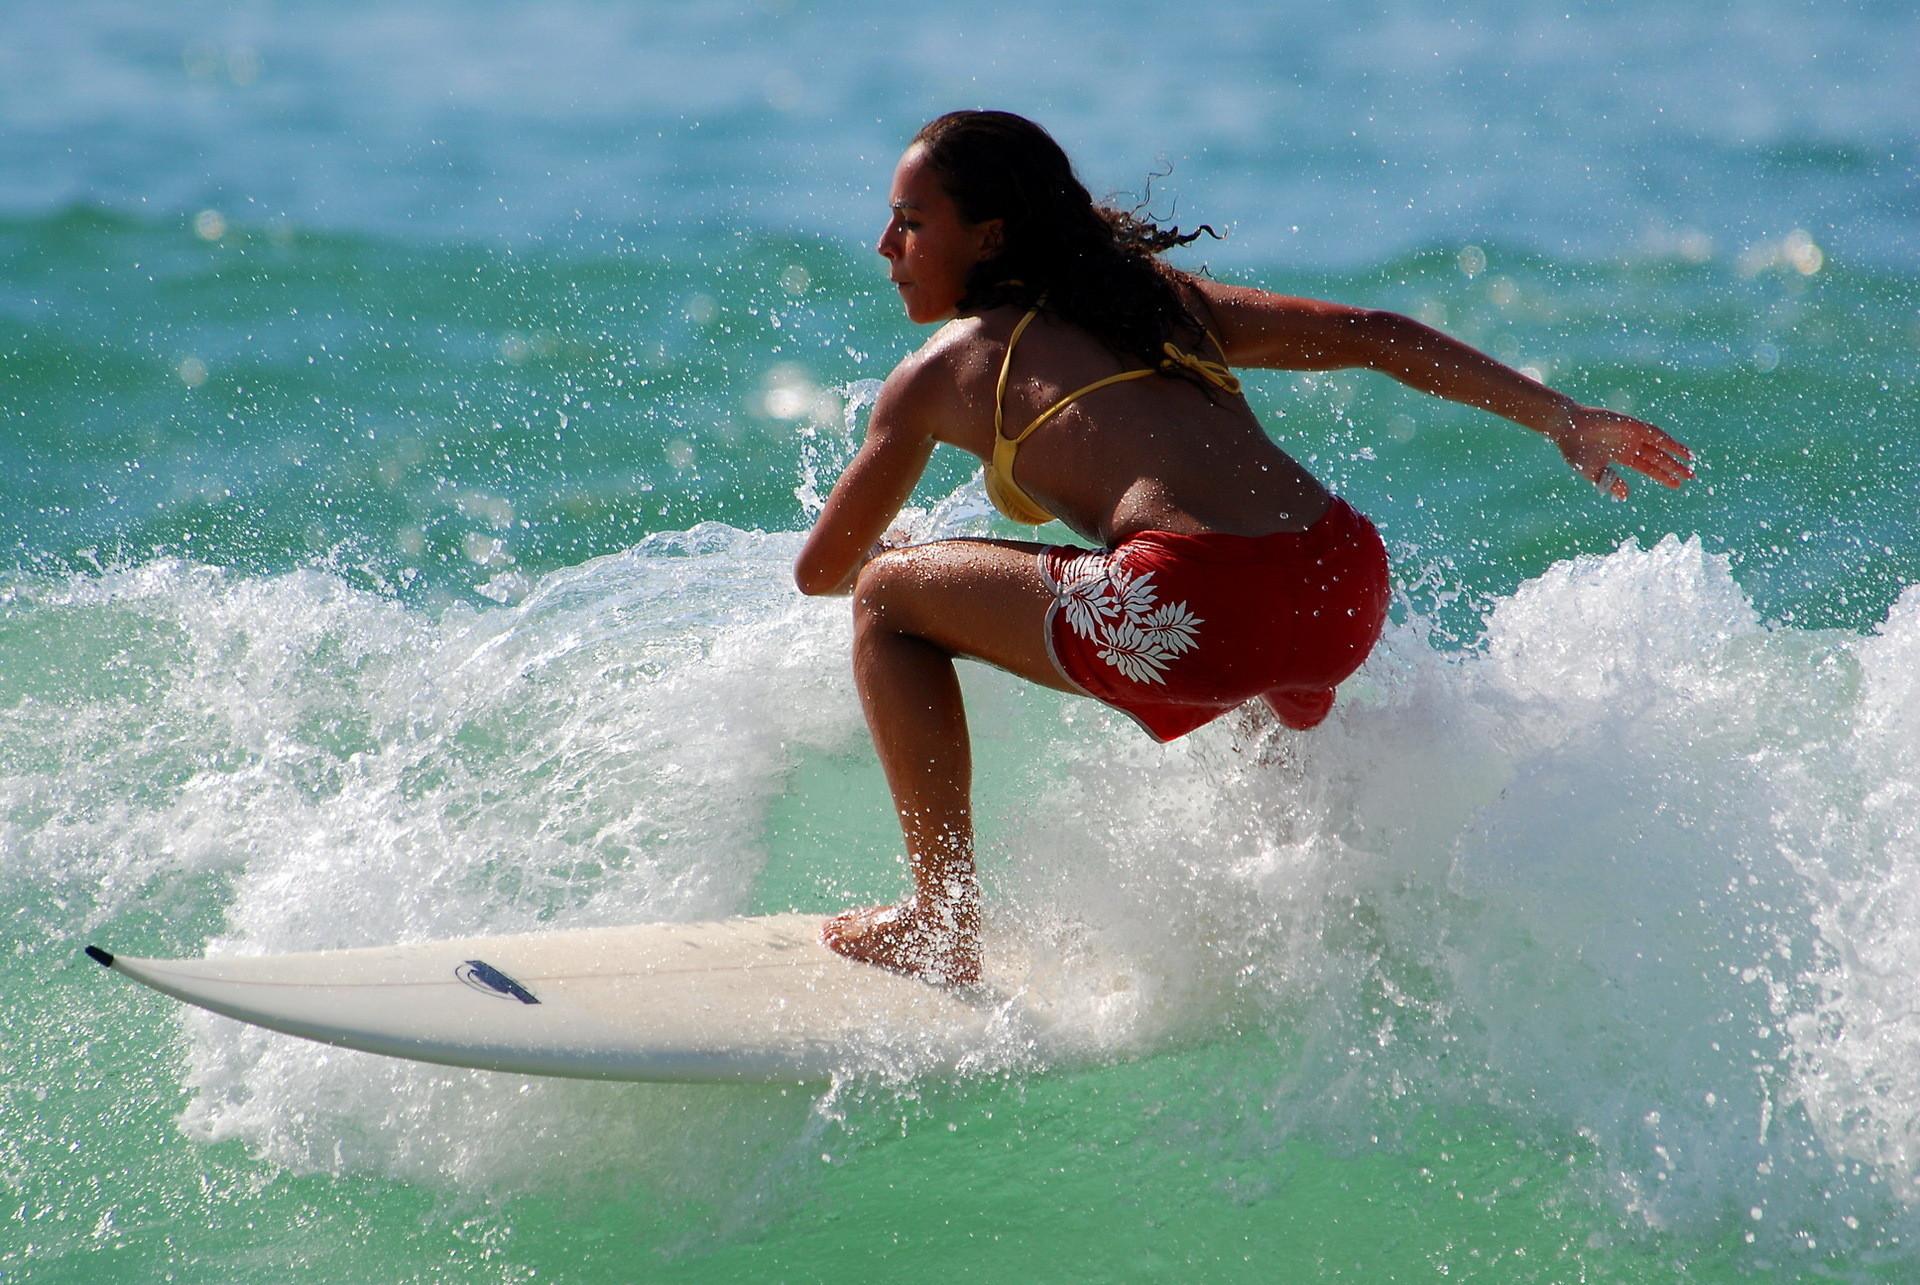 Surfer Girl Wallpaper | … girl hd desktop Sunset Surfer Girl  Sexy Waves